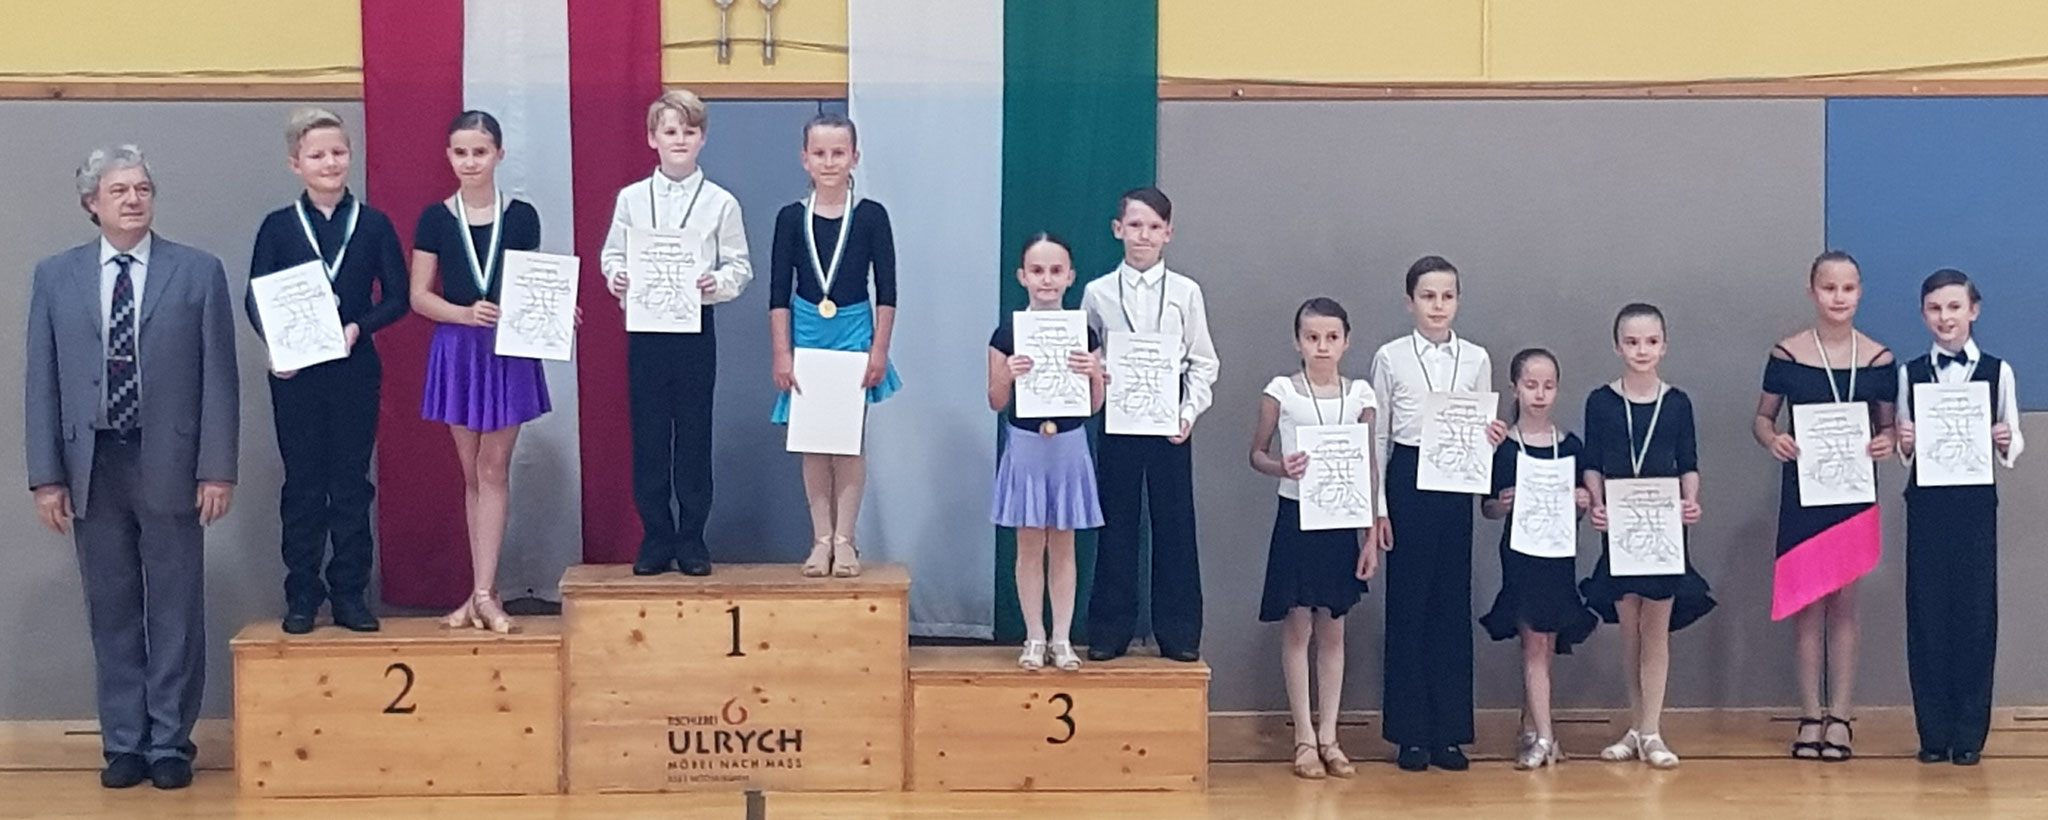 Schüler Latein Breitensport - 1. Paul Pongratz/Elina Schwentner - TSC academy of dance